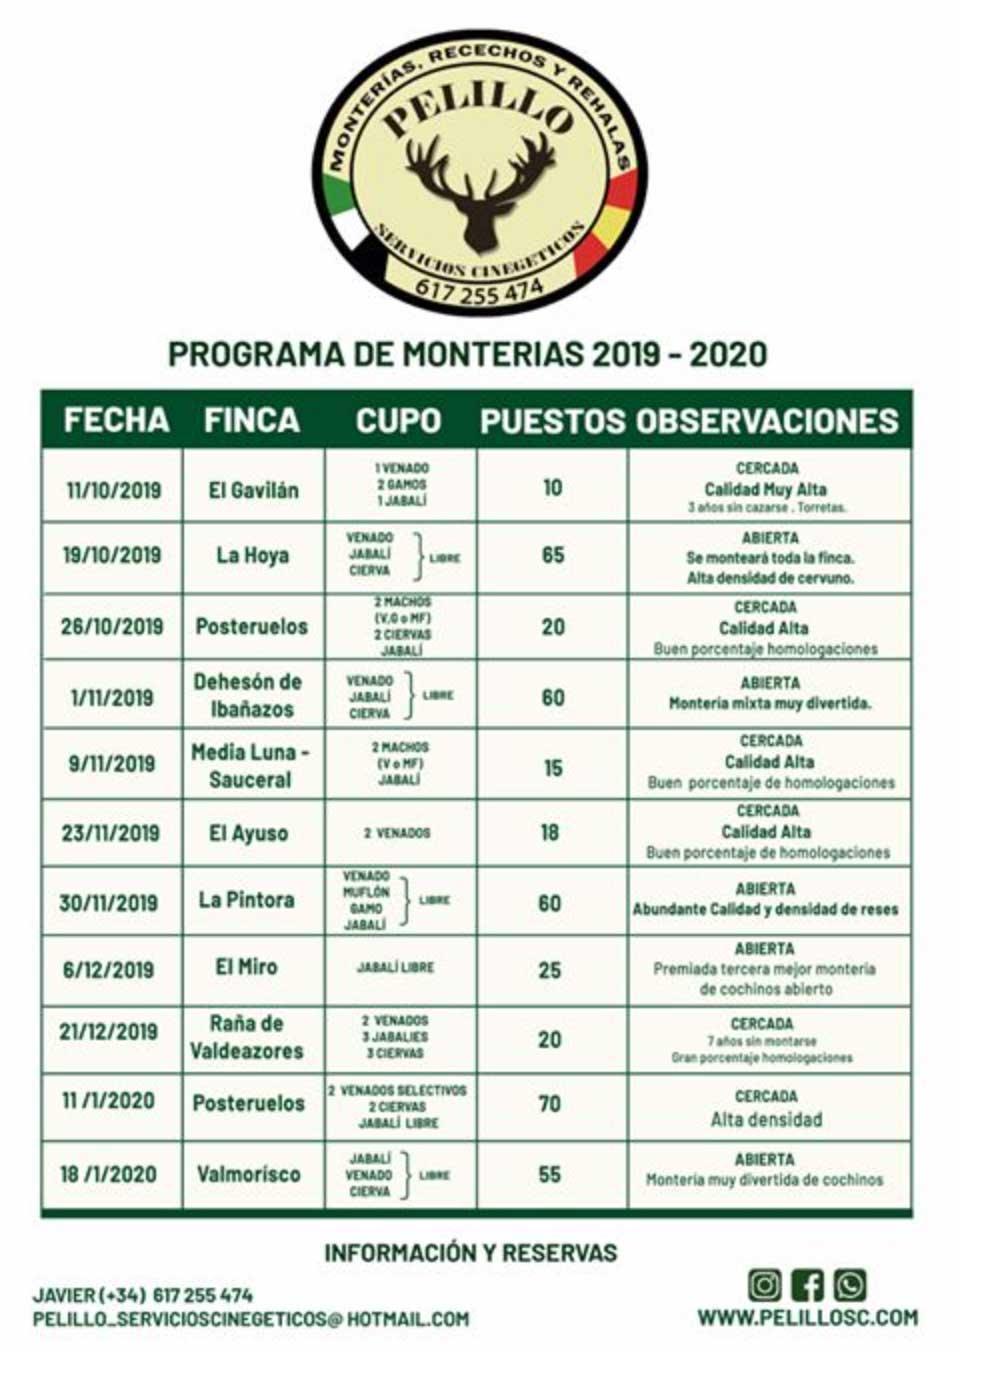 Programa Pelillo SC